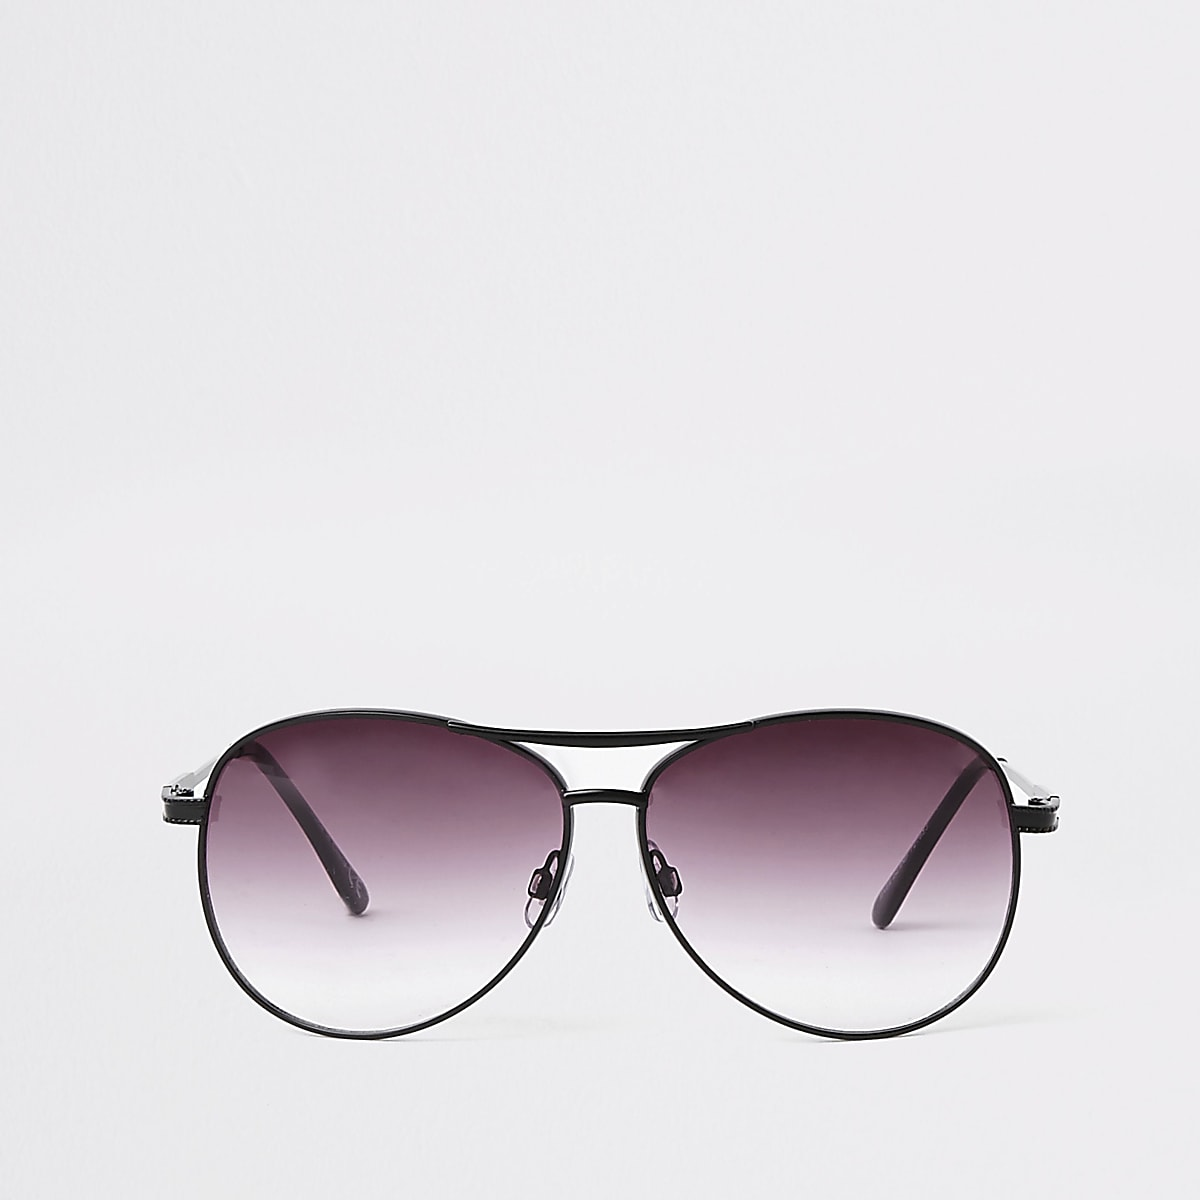 Black purple lens aviator sunglasses